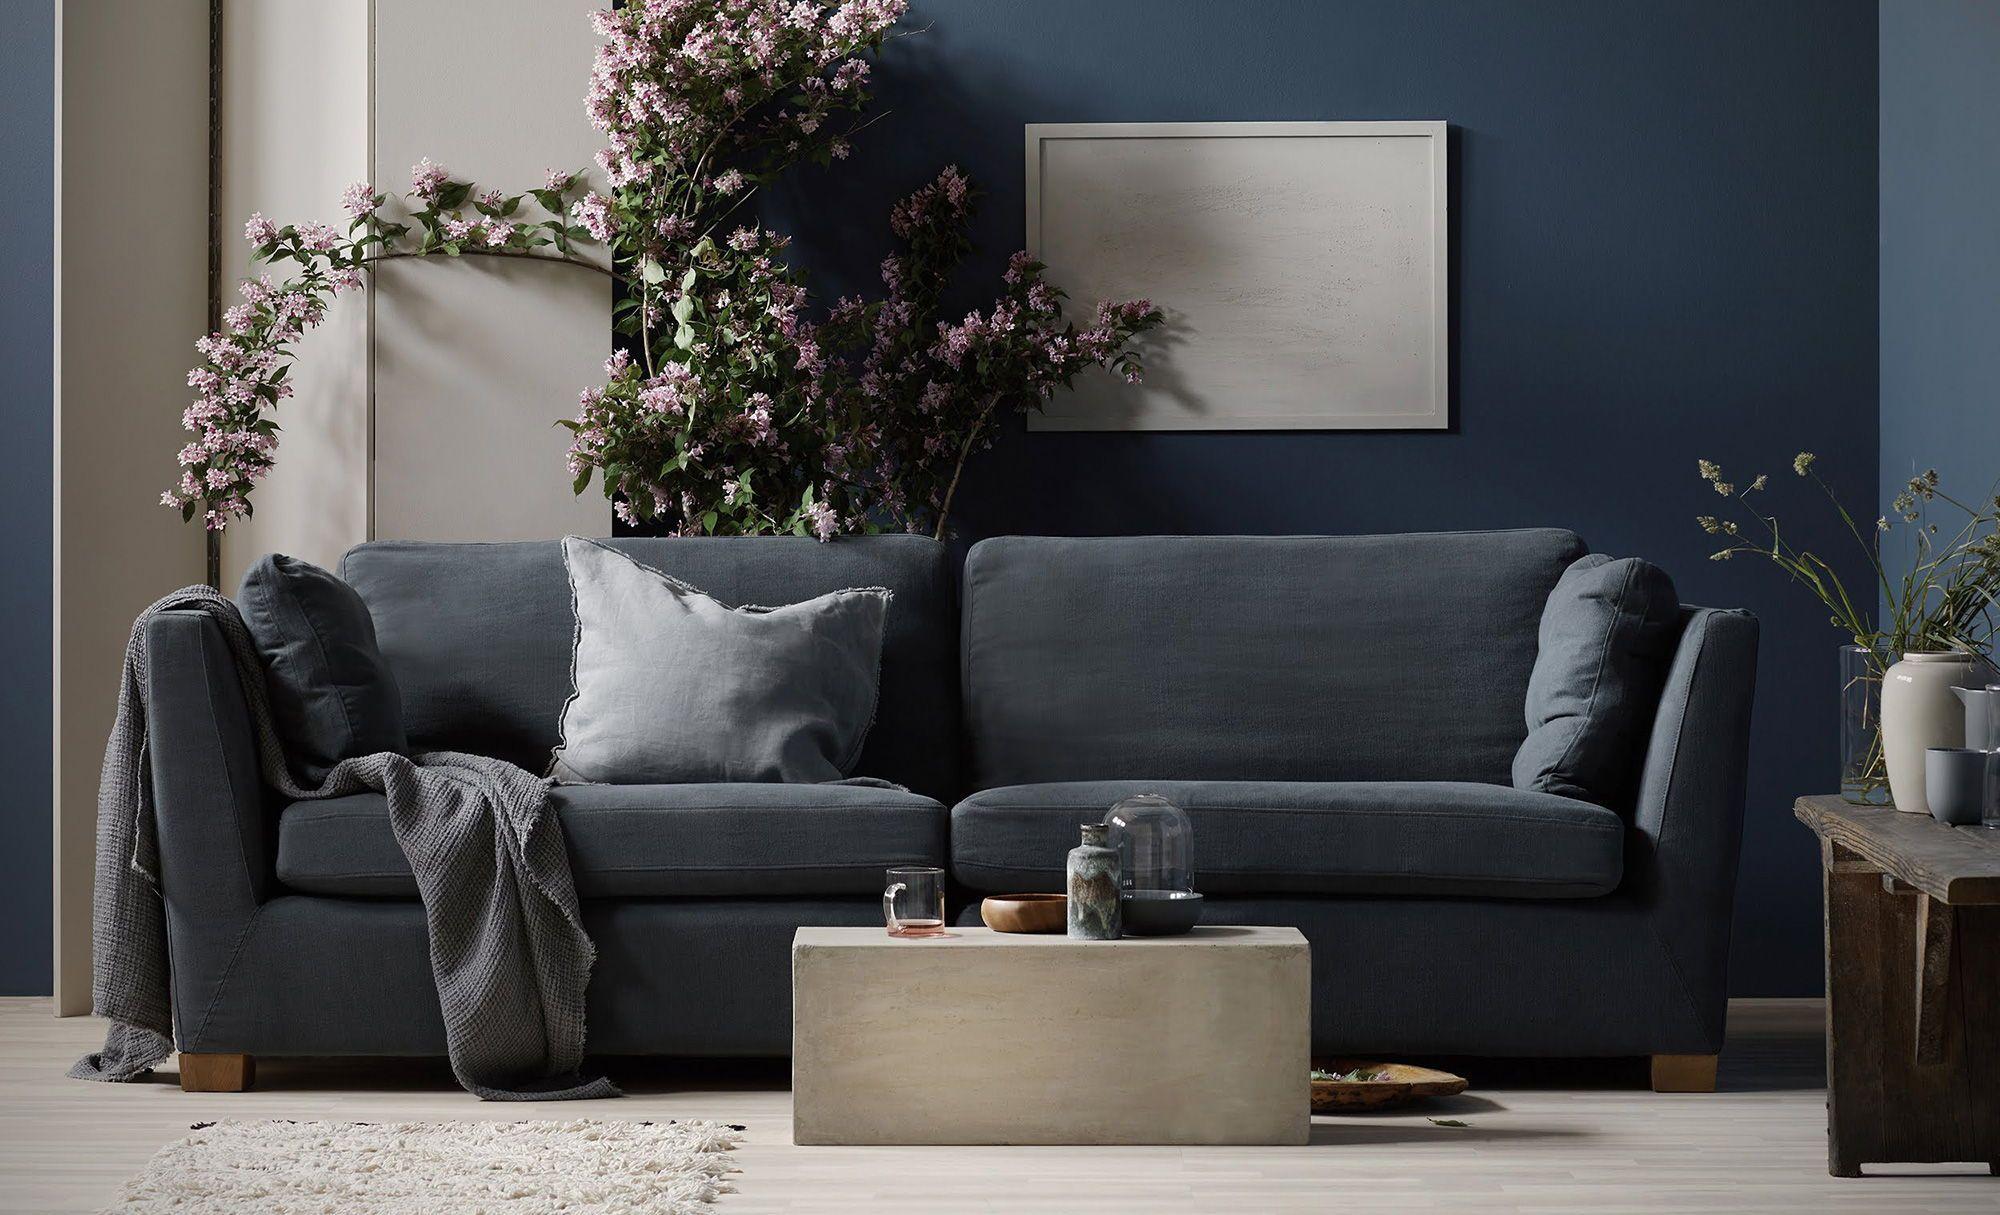 Stunning Scandinavian Living Room Designed By Daniella Witte - Cherry